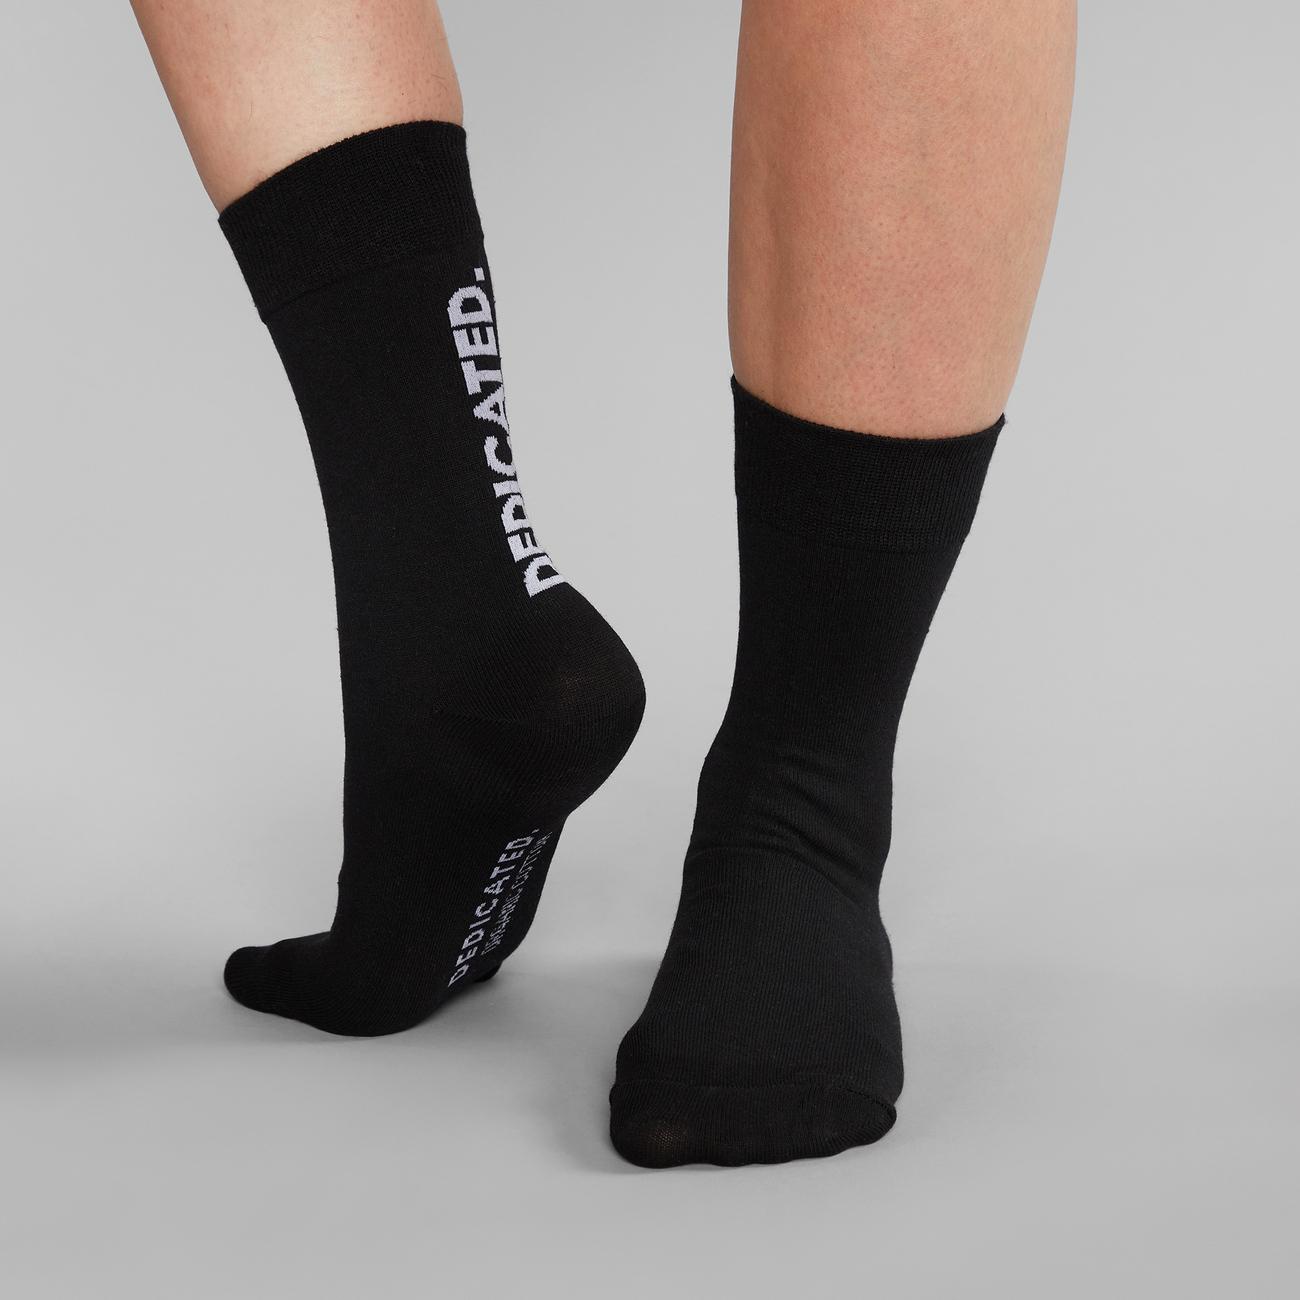 Socks Sigtuna Dedicated Logo Black